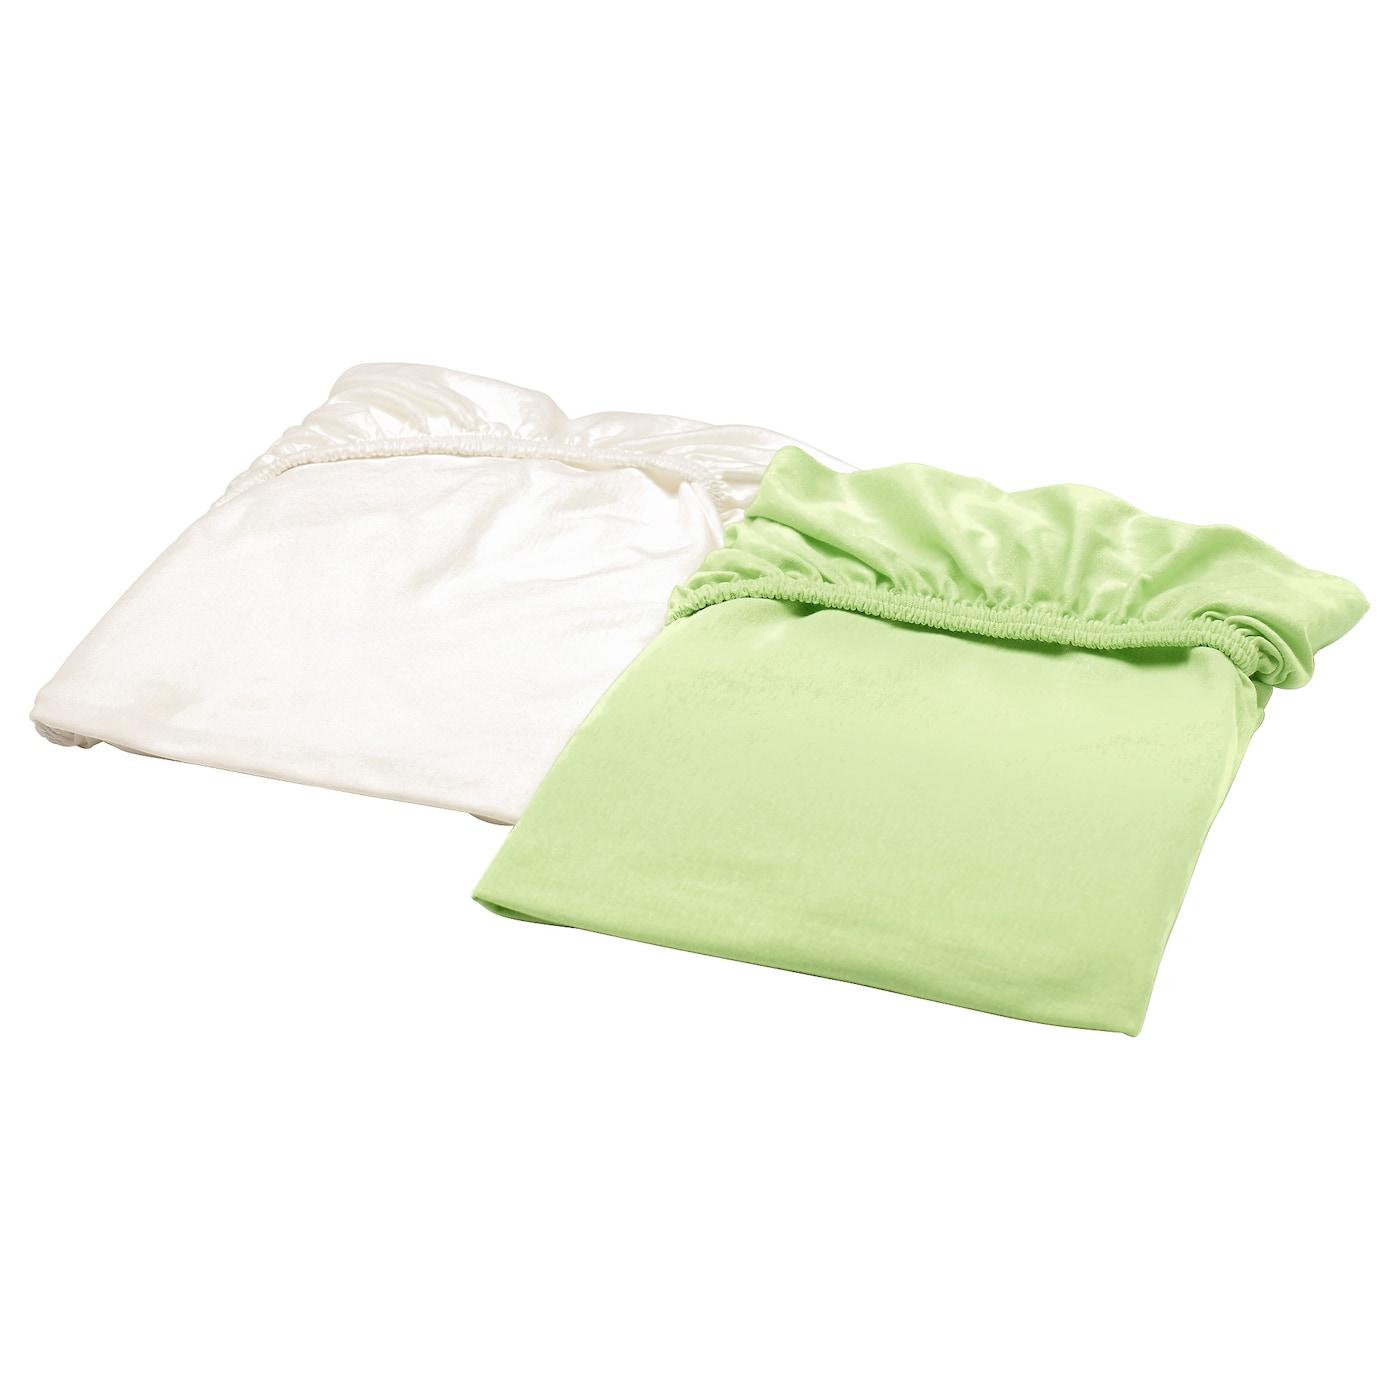 Len drap housse pour lit b b blanc 60x120 cm ikea for Drap housse lit bebe